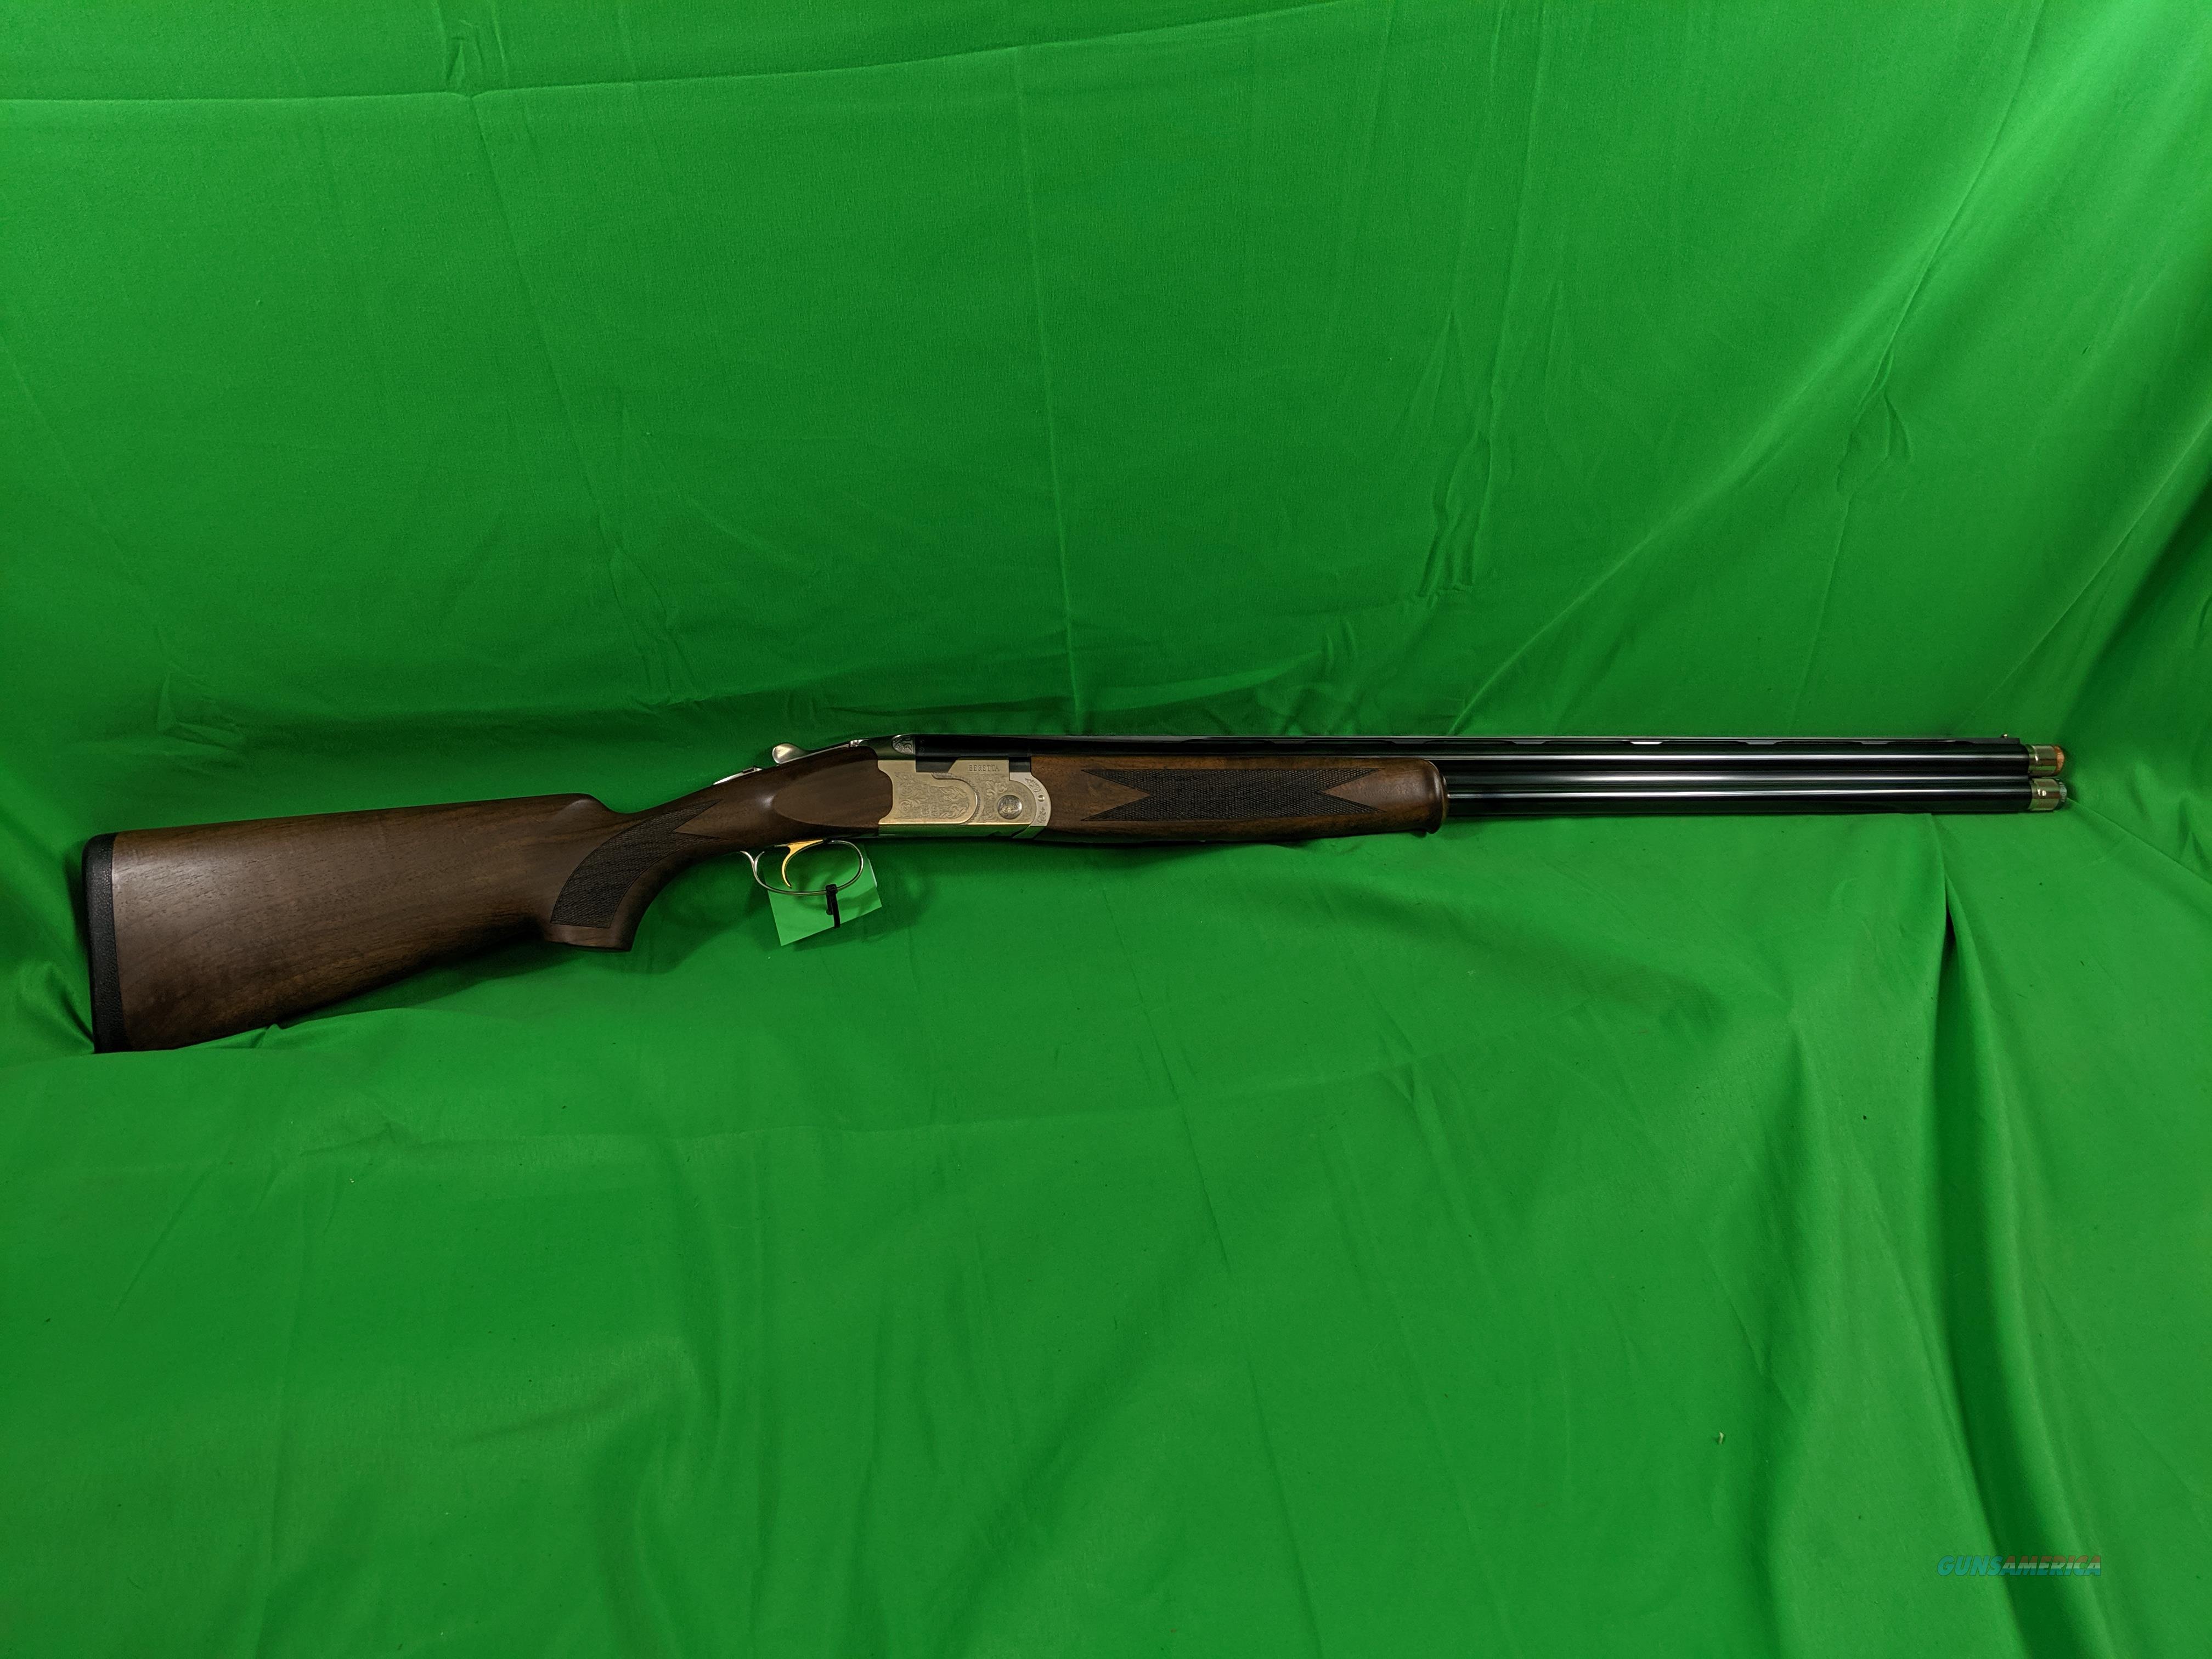 Beretta 686 Silver Pigeon I 12 Gauge  Guns > Shotguns > Beretta Shotguns > O/U > Trap/Skeet